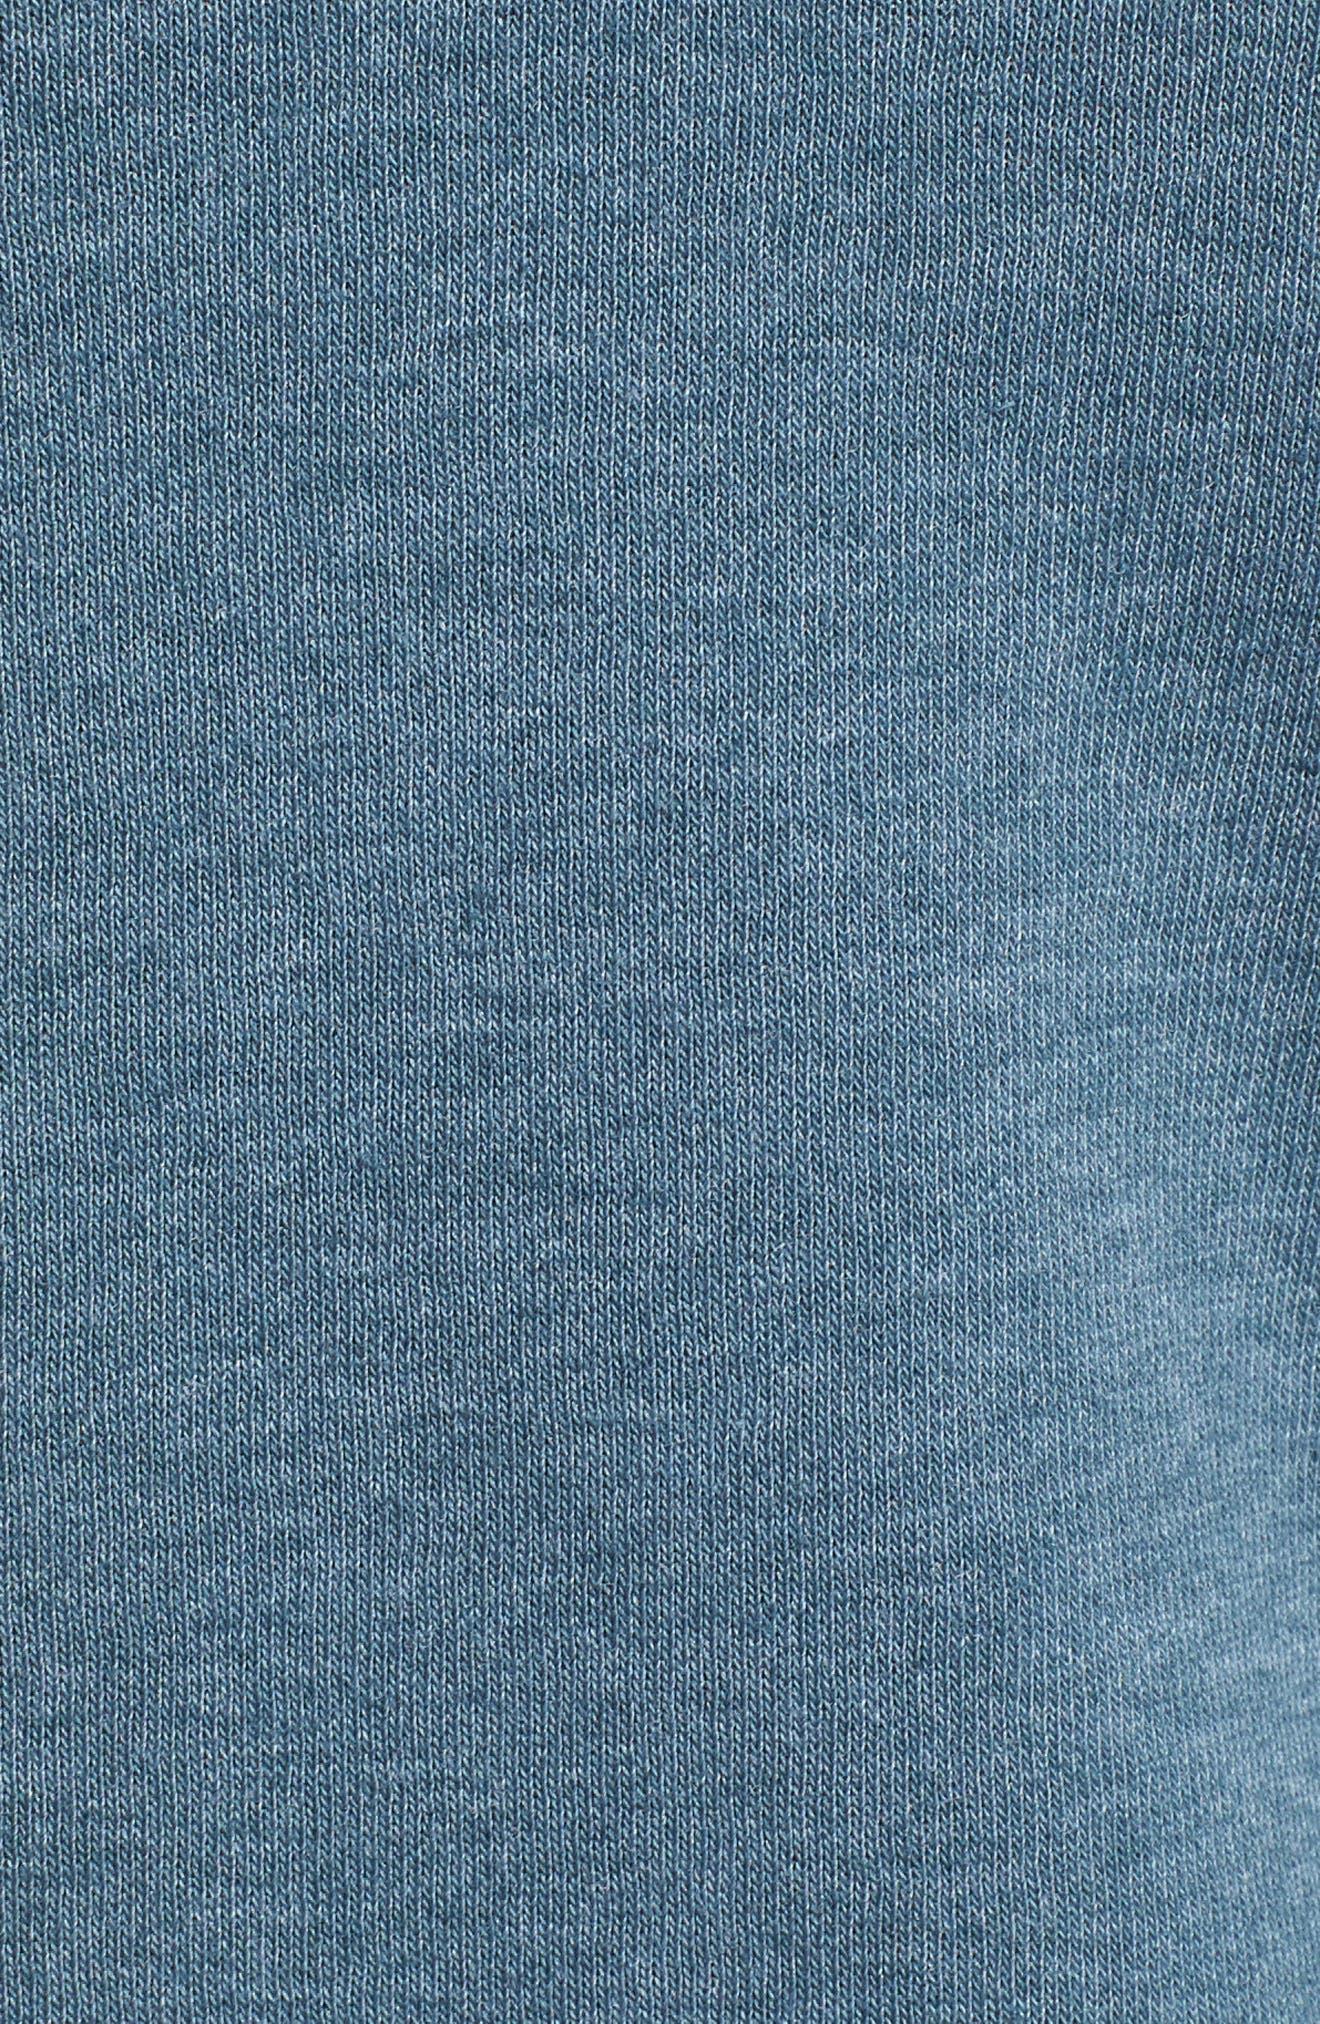 Half Dome Cotton Blend Hoodie,                             Alternate thumbnail 5, color,                             Conquer Blue / Monument Grey